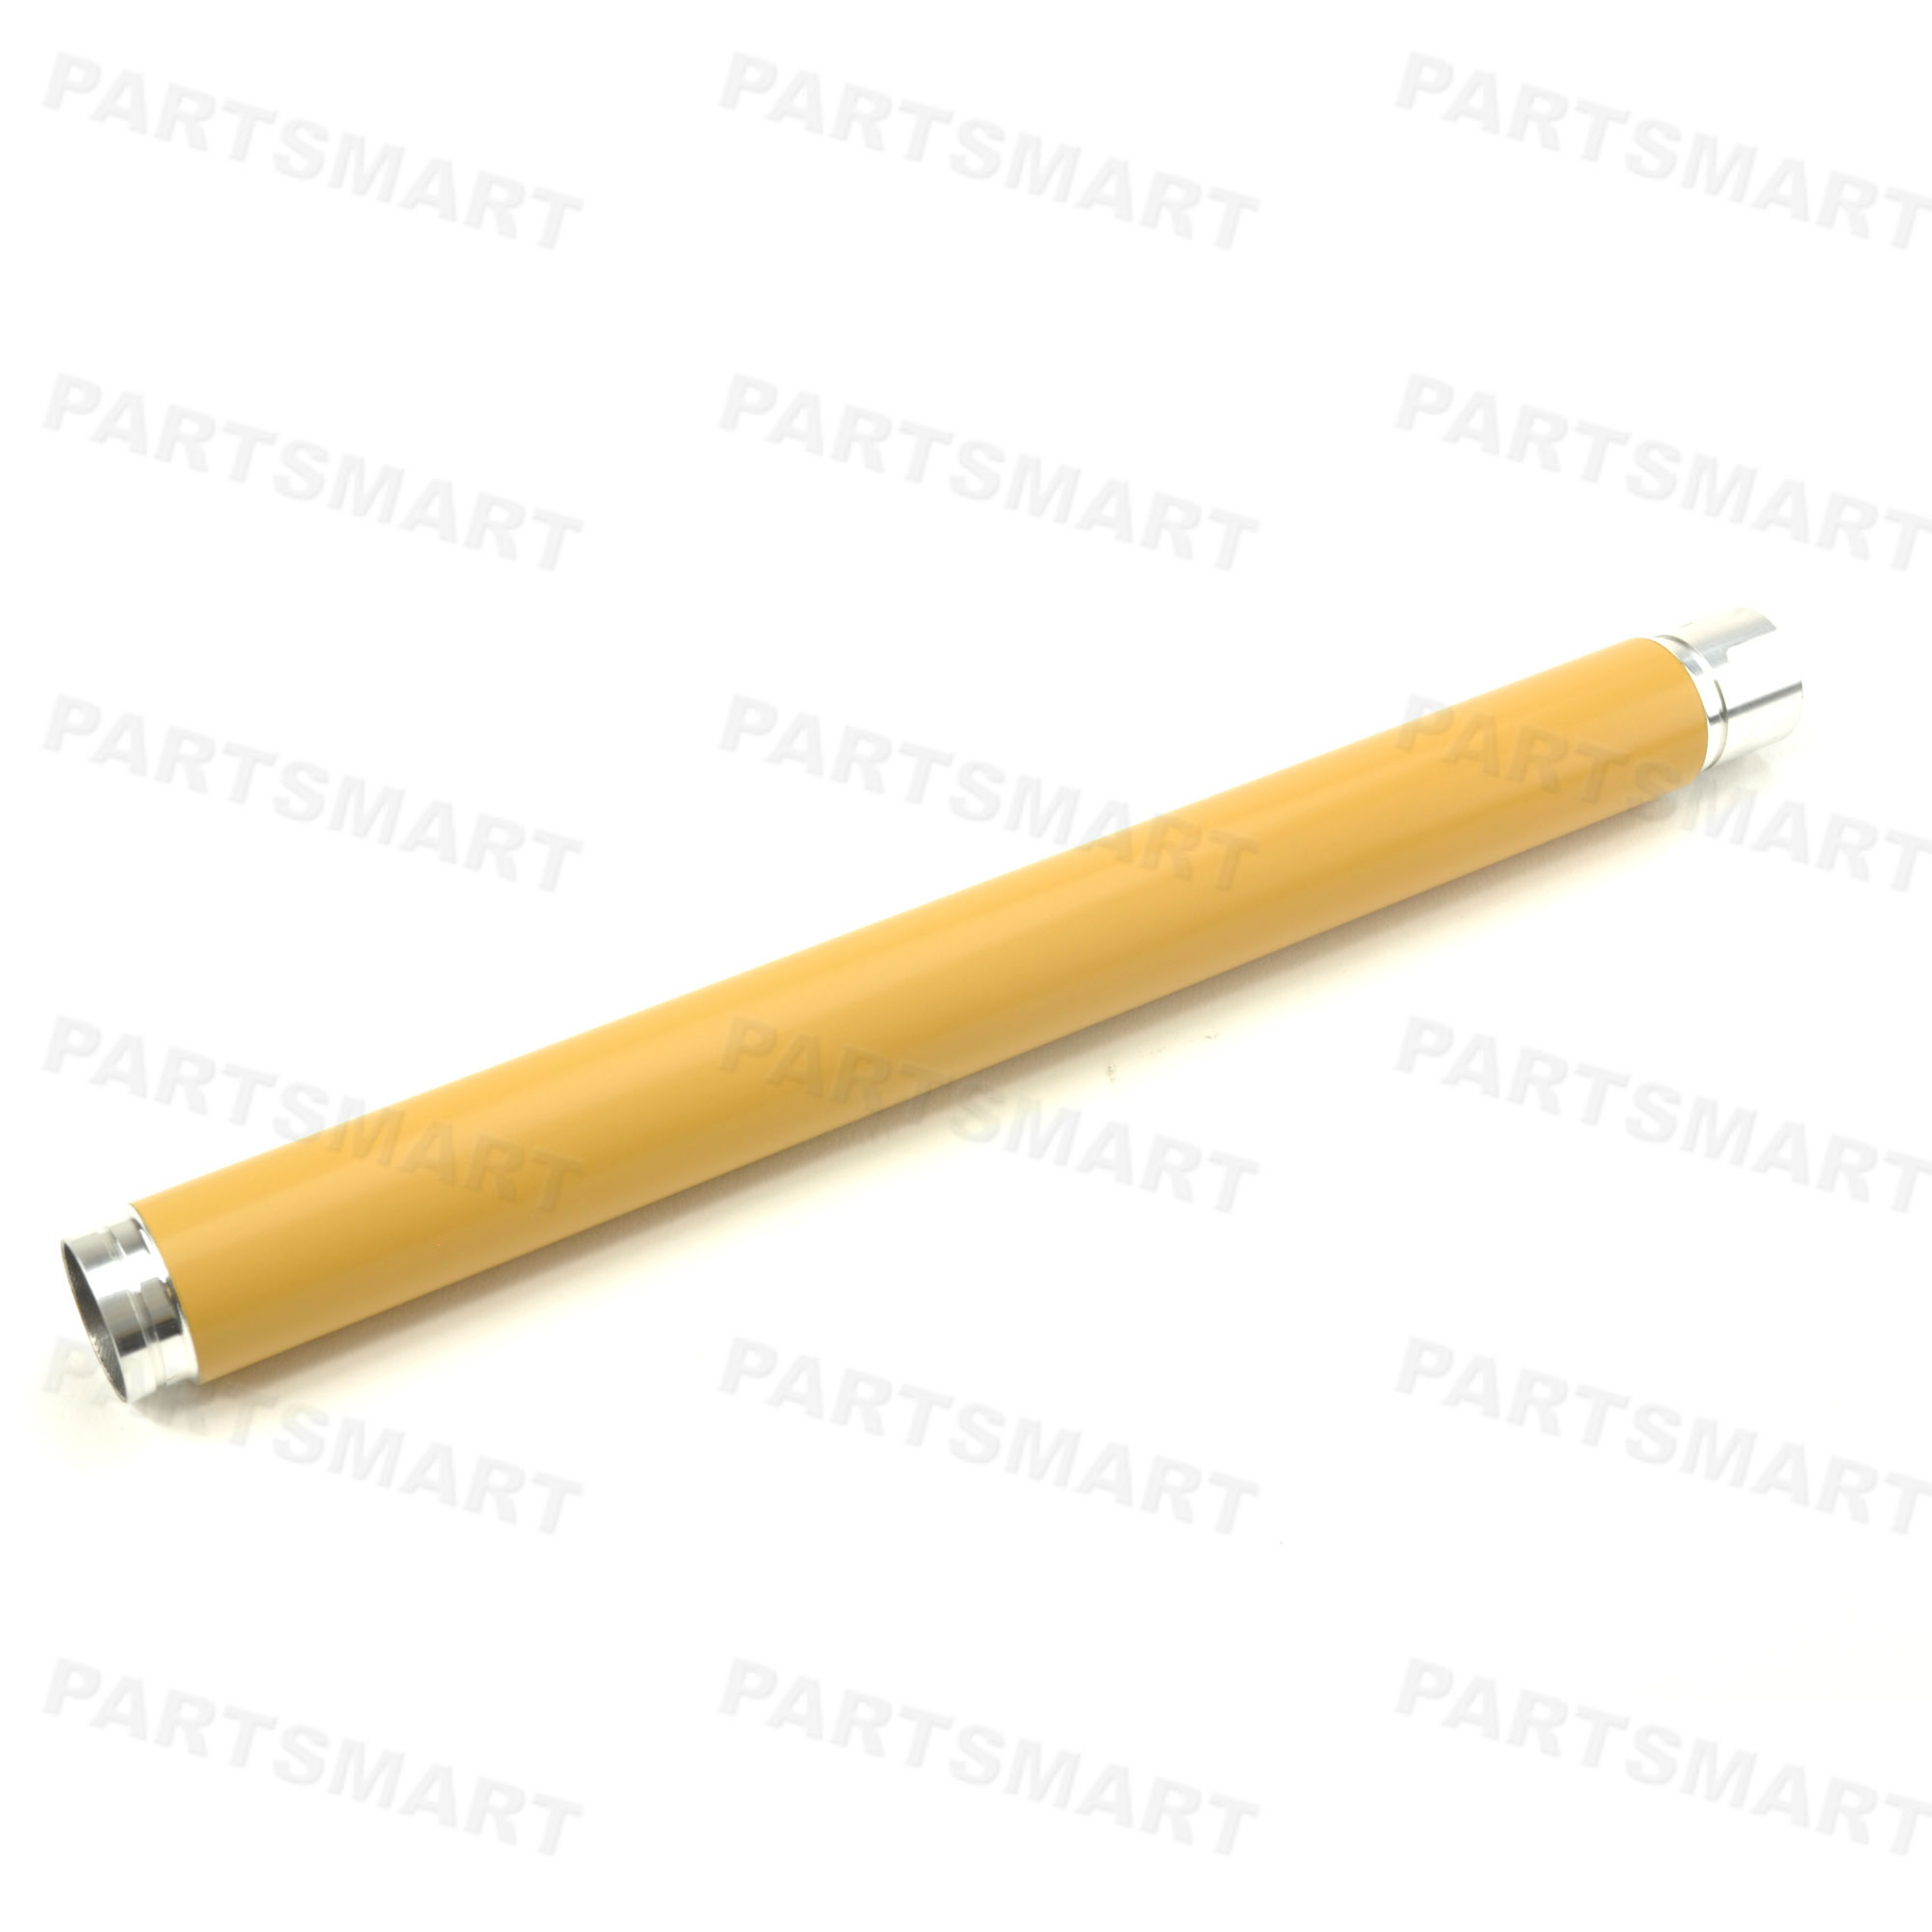 UFR-X3615 Upper Fuser Roller for Xerox Phaser 3610, WorkCentre 3615,  WorkCentre 3655